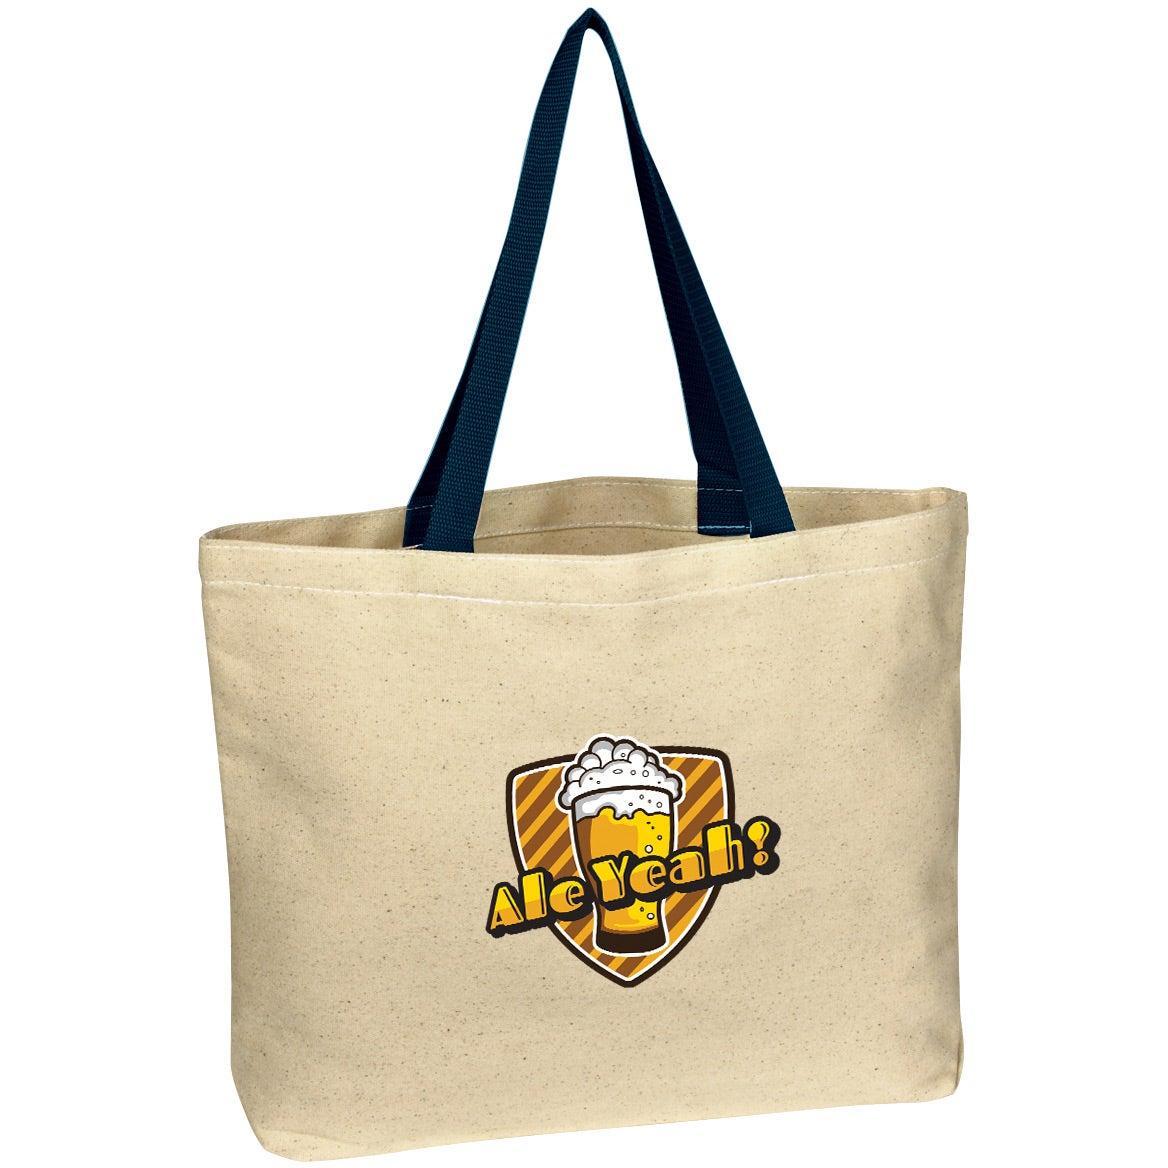 9141a1335c1 Natural Cotton Canvas Tote Bag